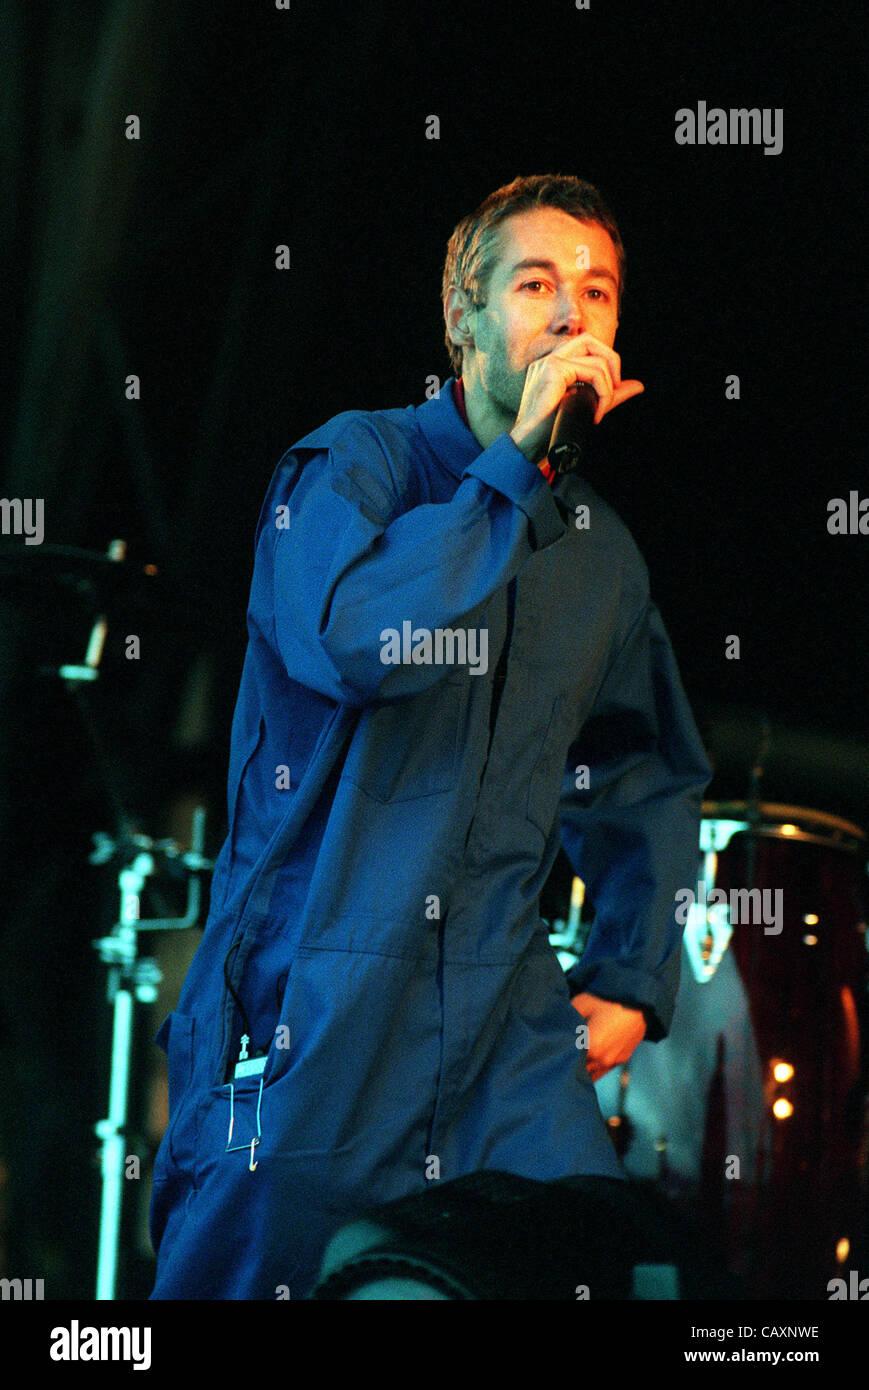 ADAM YAUCH ''MCA''.SINGER ''BEASTIE BOYS''.15/07/1998.N90E23C. - Stock Image